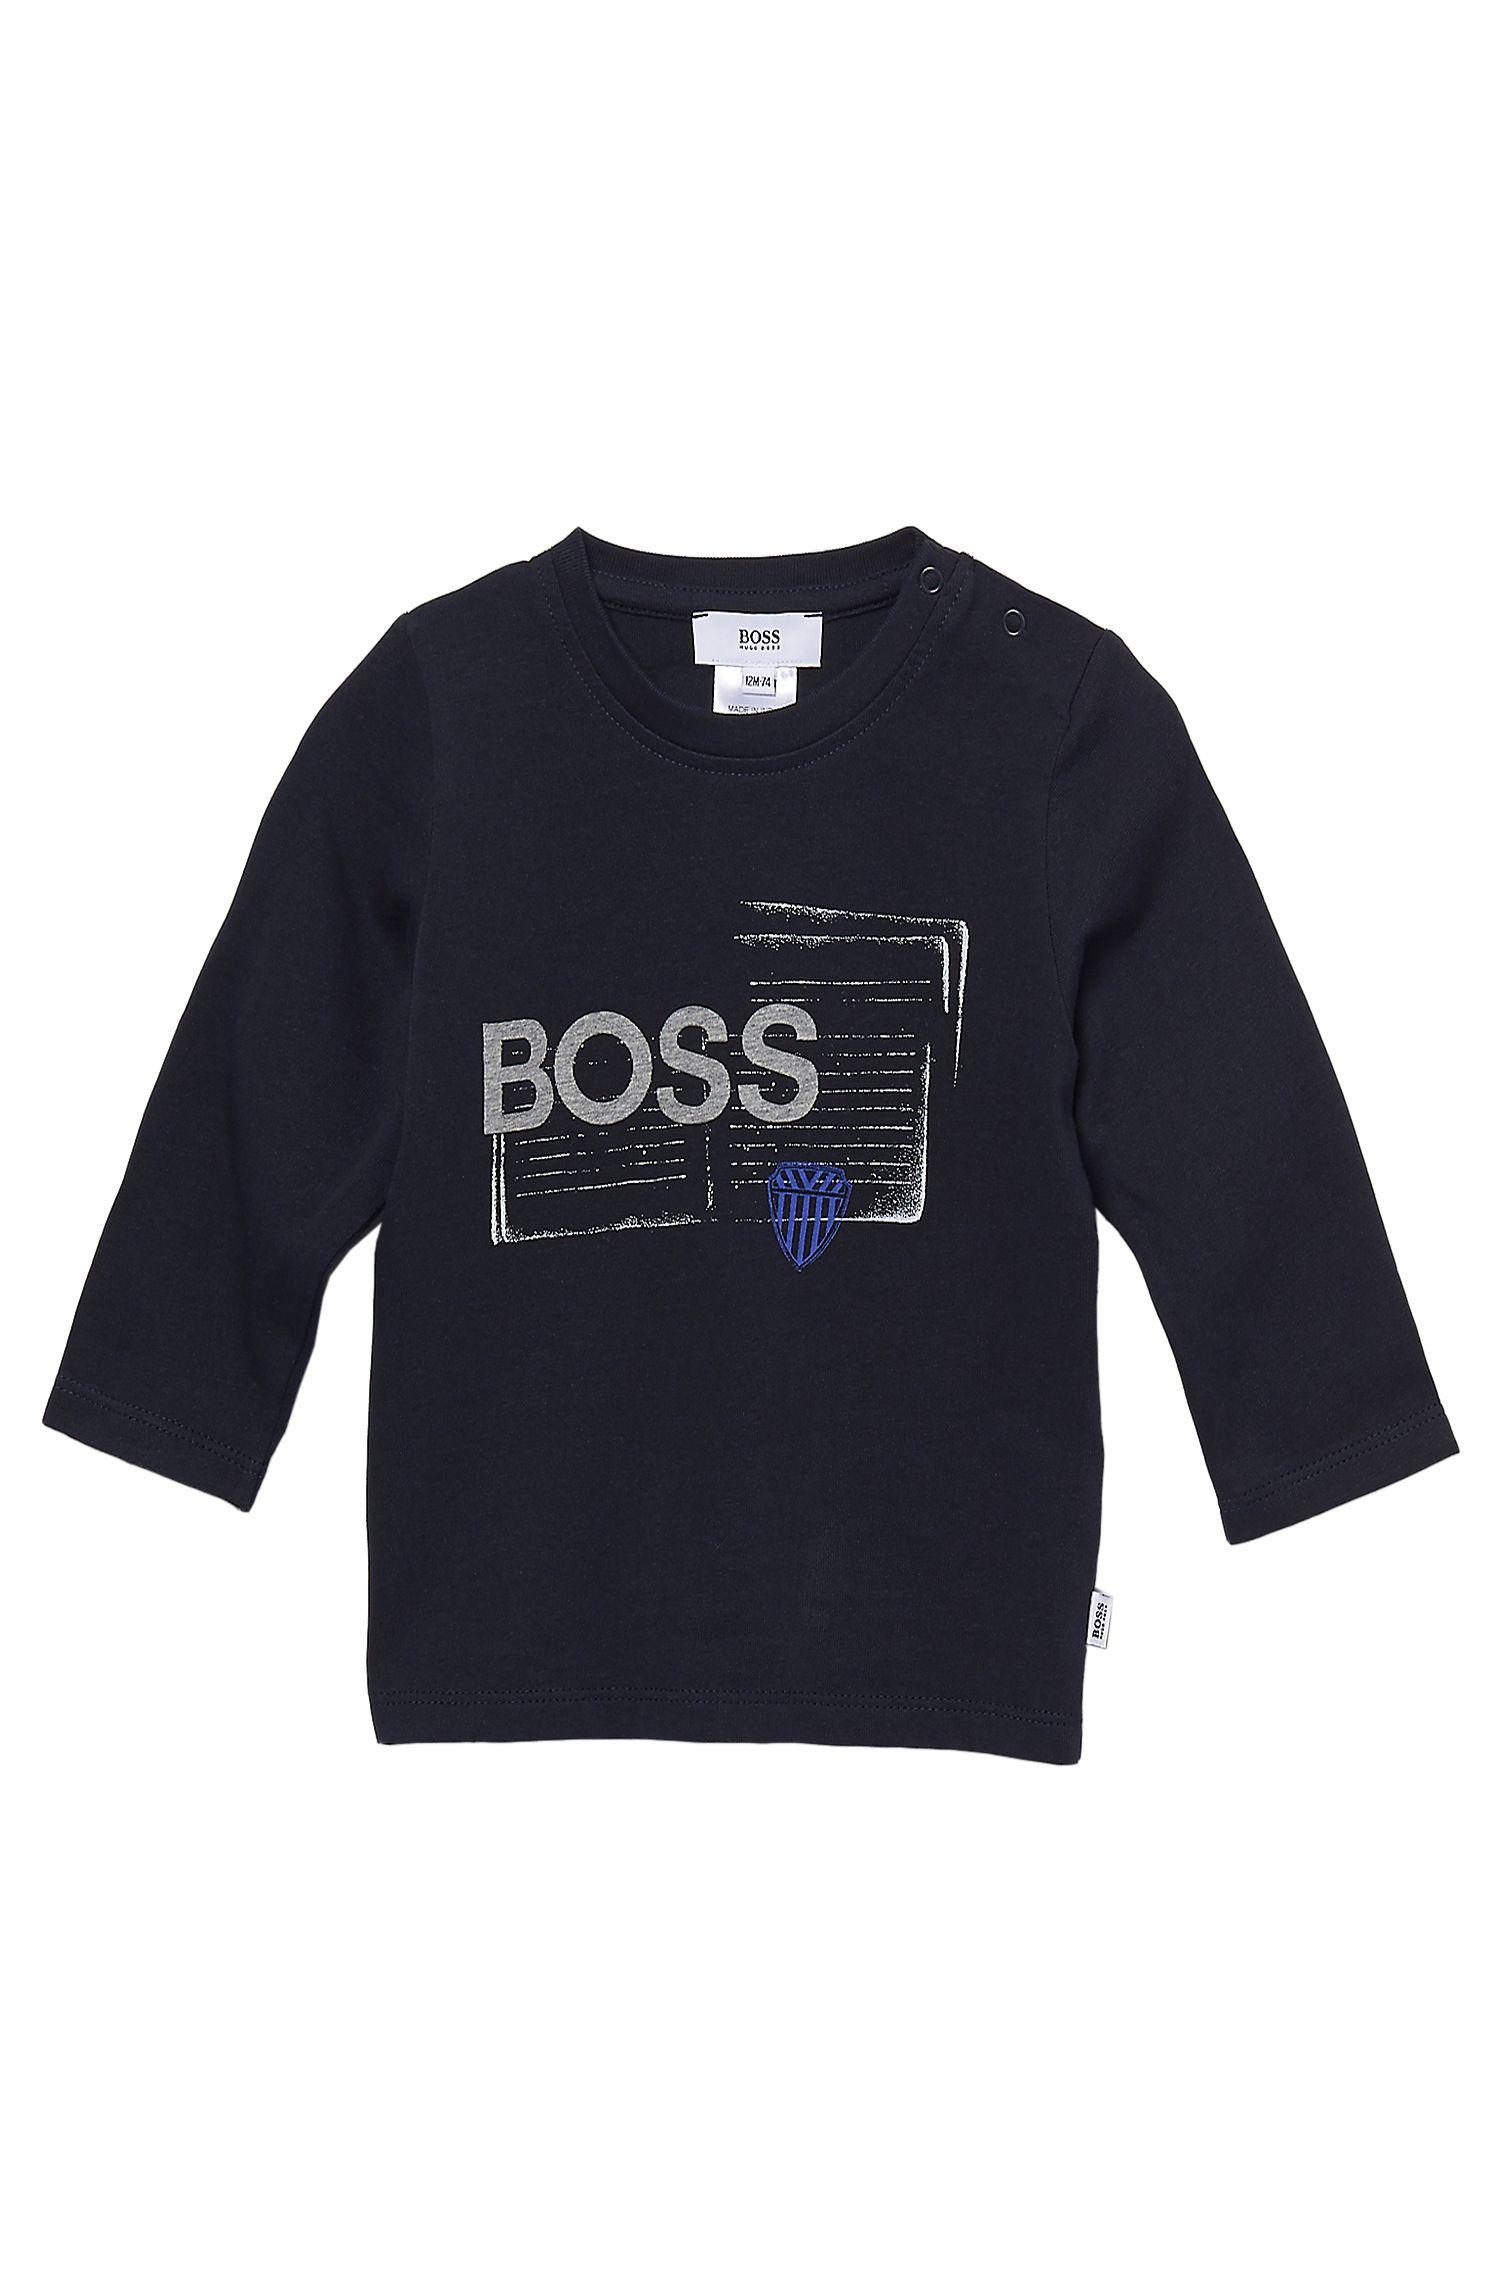 'J05263'   Toddler Long-Sleeved Cotton Print Crewneck T-Shirt